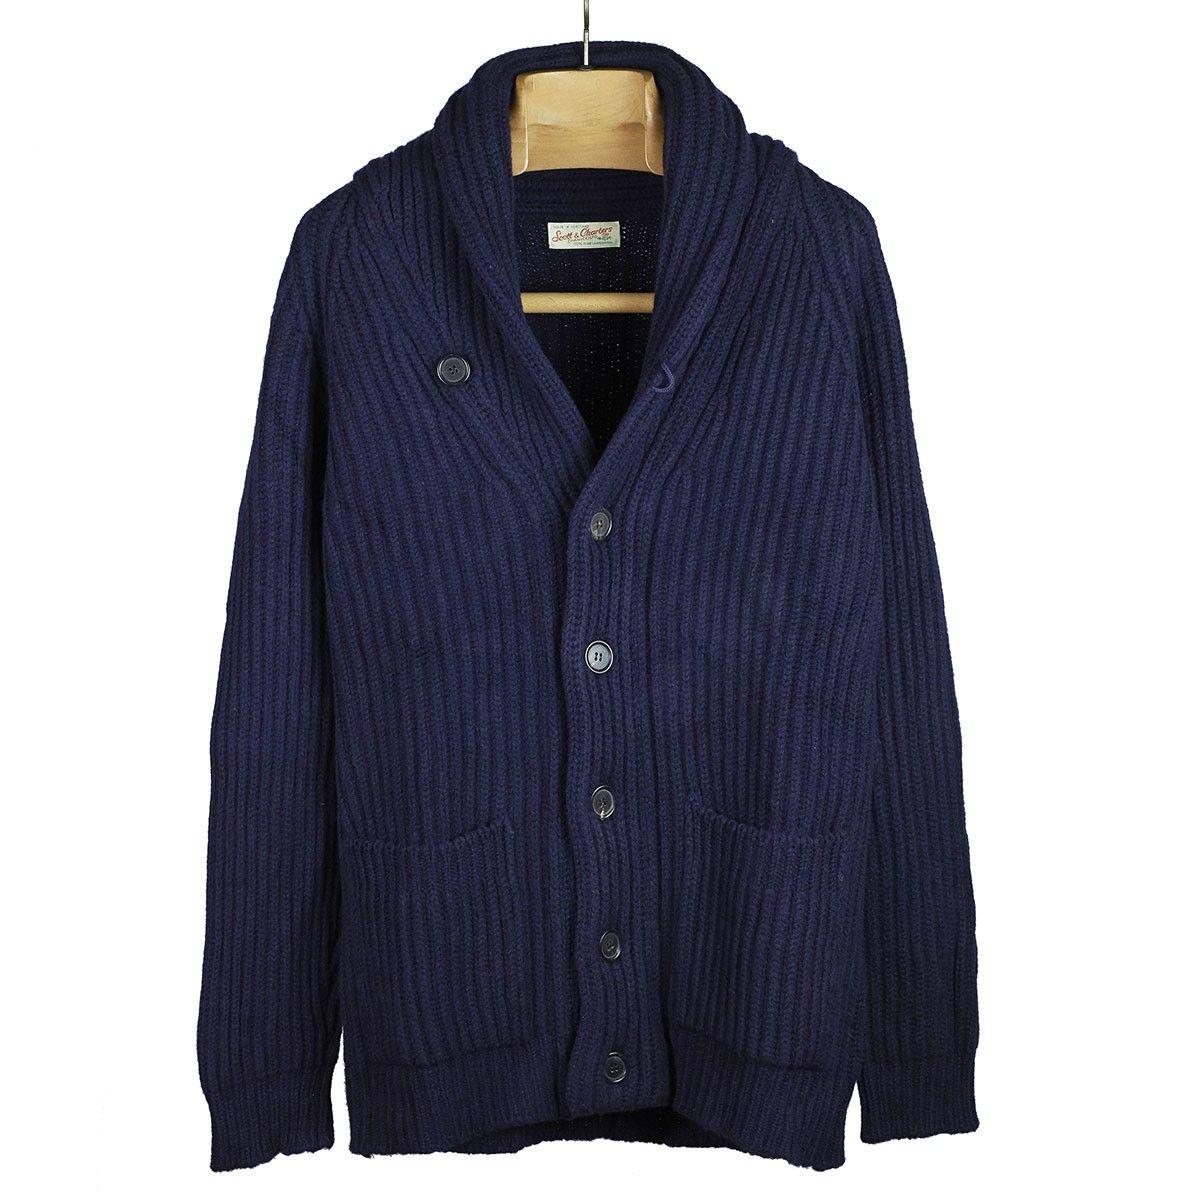 Navy blue shawl collar lambswool cardigan jacket | No Man Walks ...